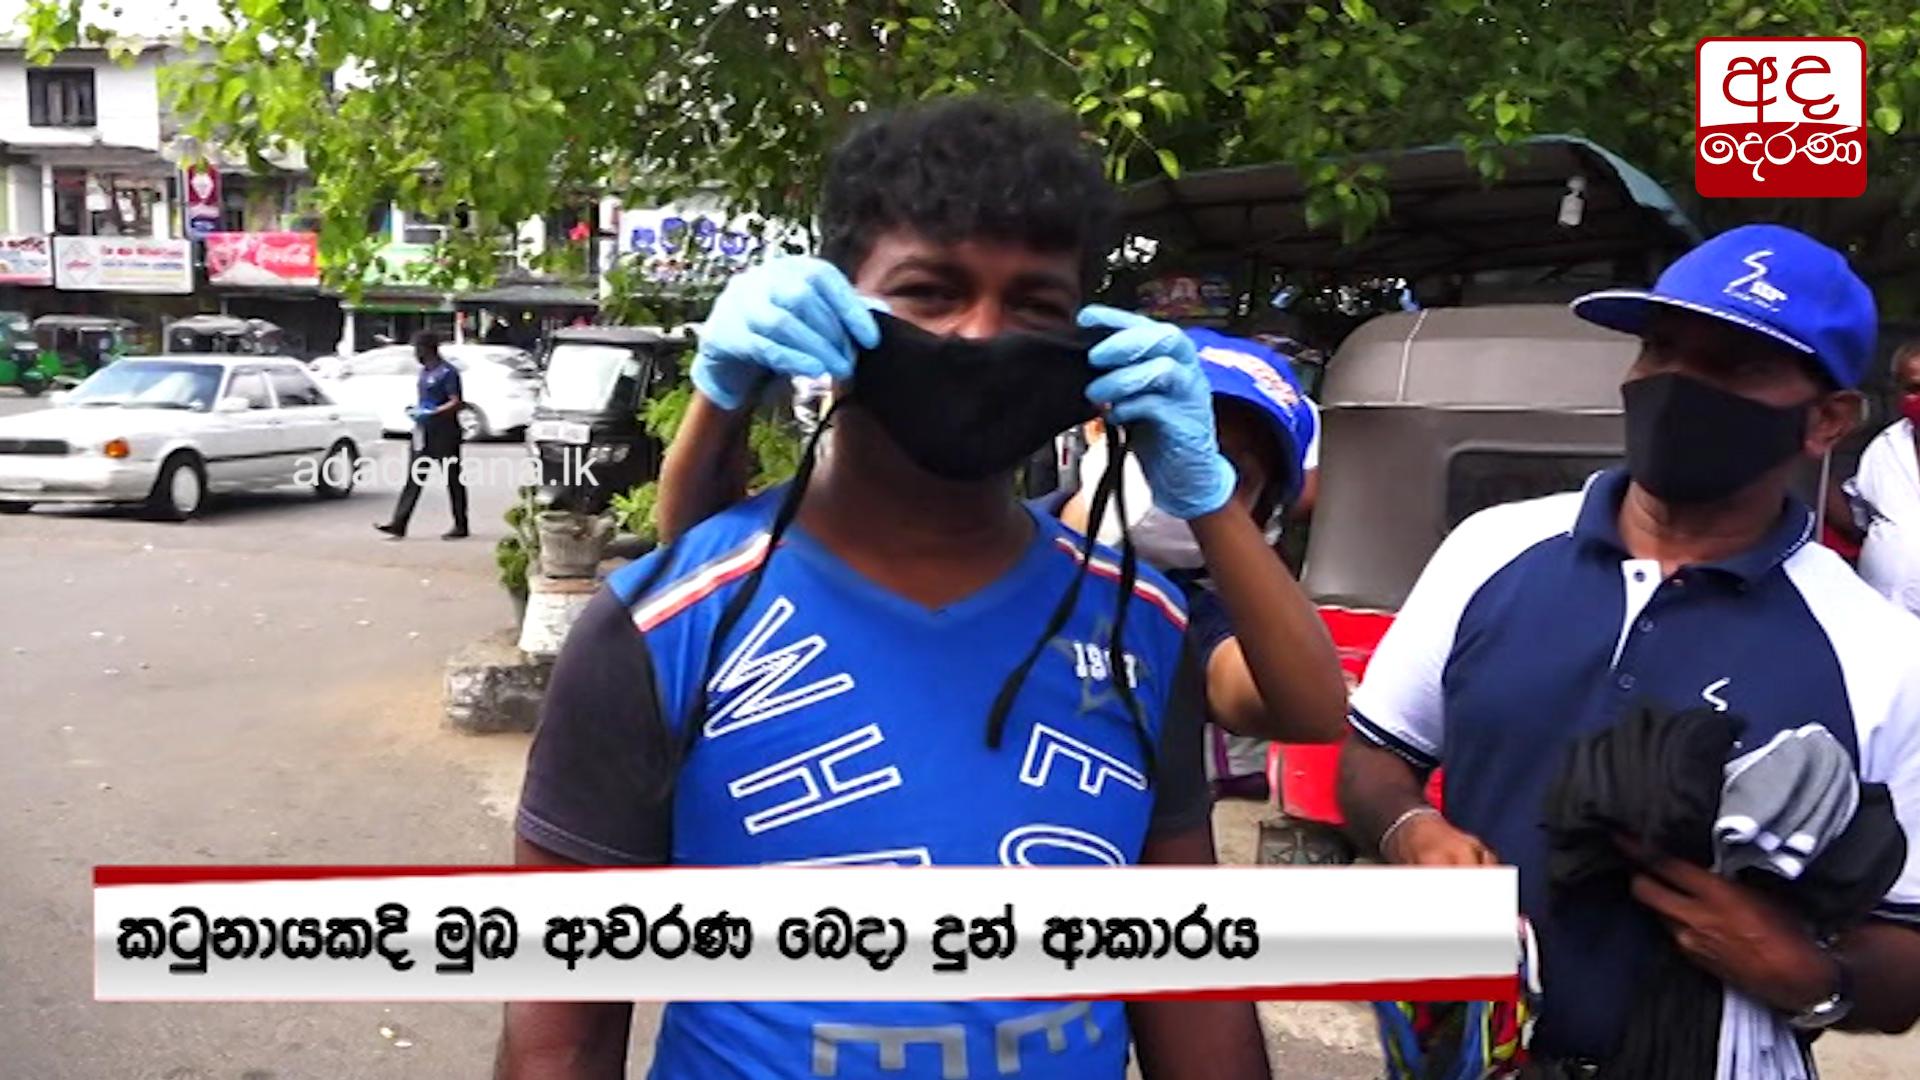 Manusath Derana distributes face masks in Katunayake